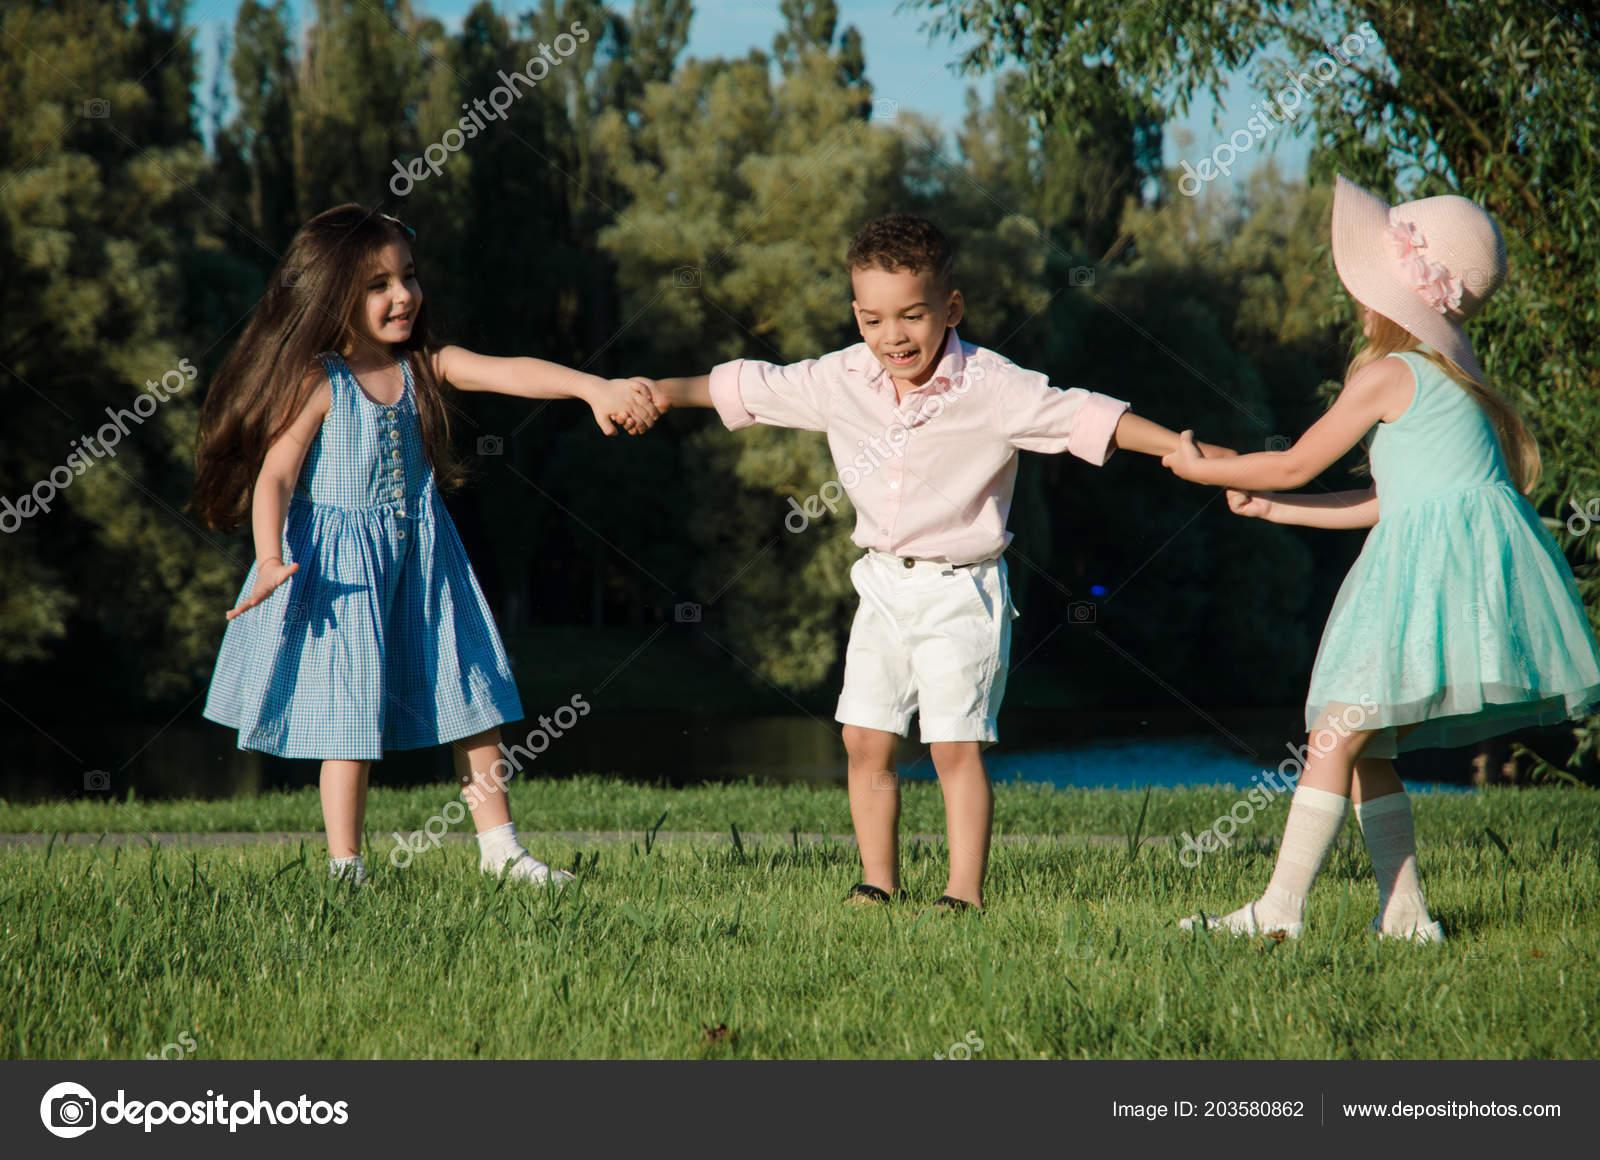 a5503e5c6d6 Μικρά Παιδιά Έπαιζαν Στο Γρασίδι Δύο Κορίτσια Και Ένα Αγόρι ...